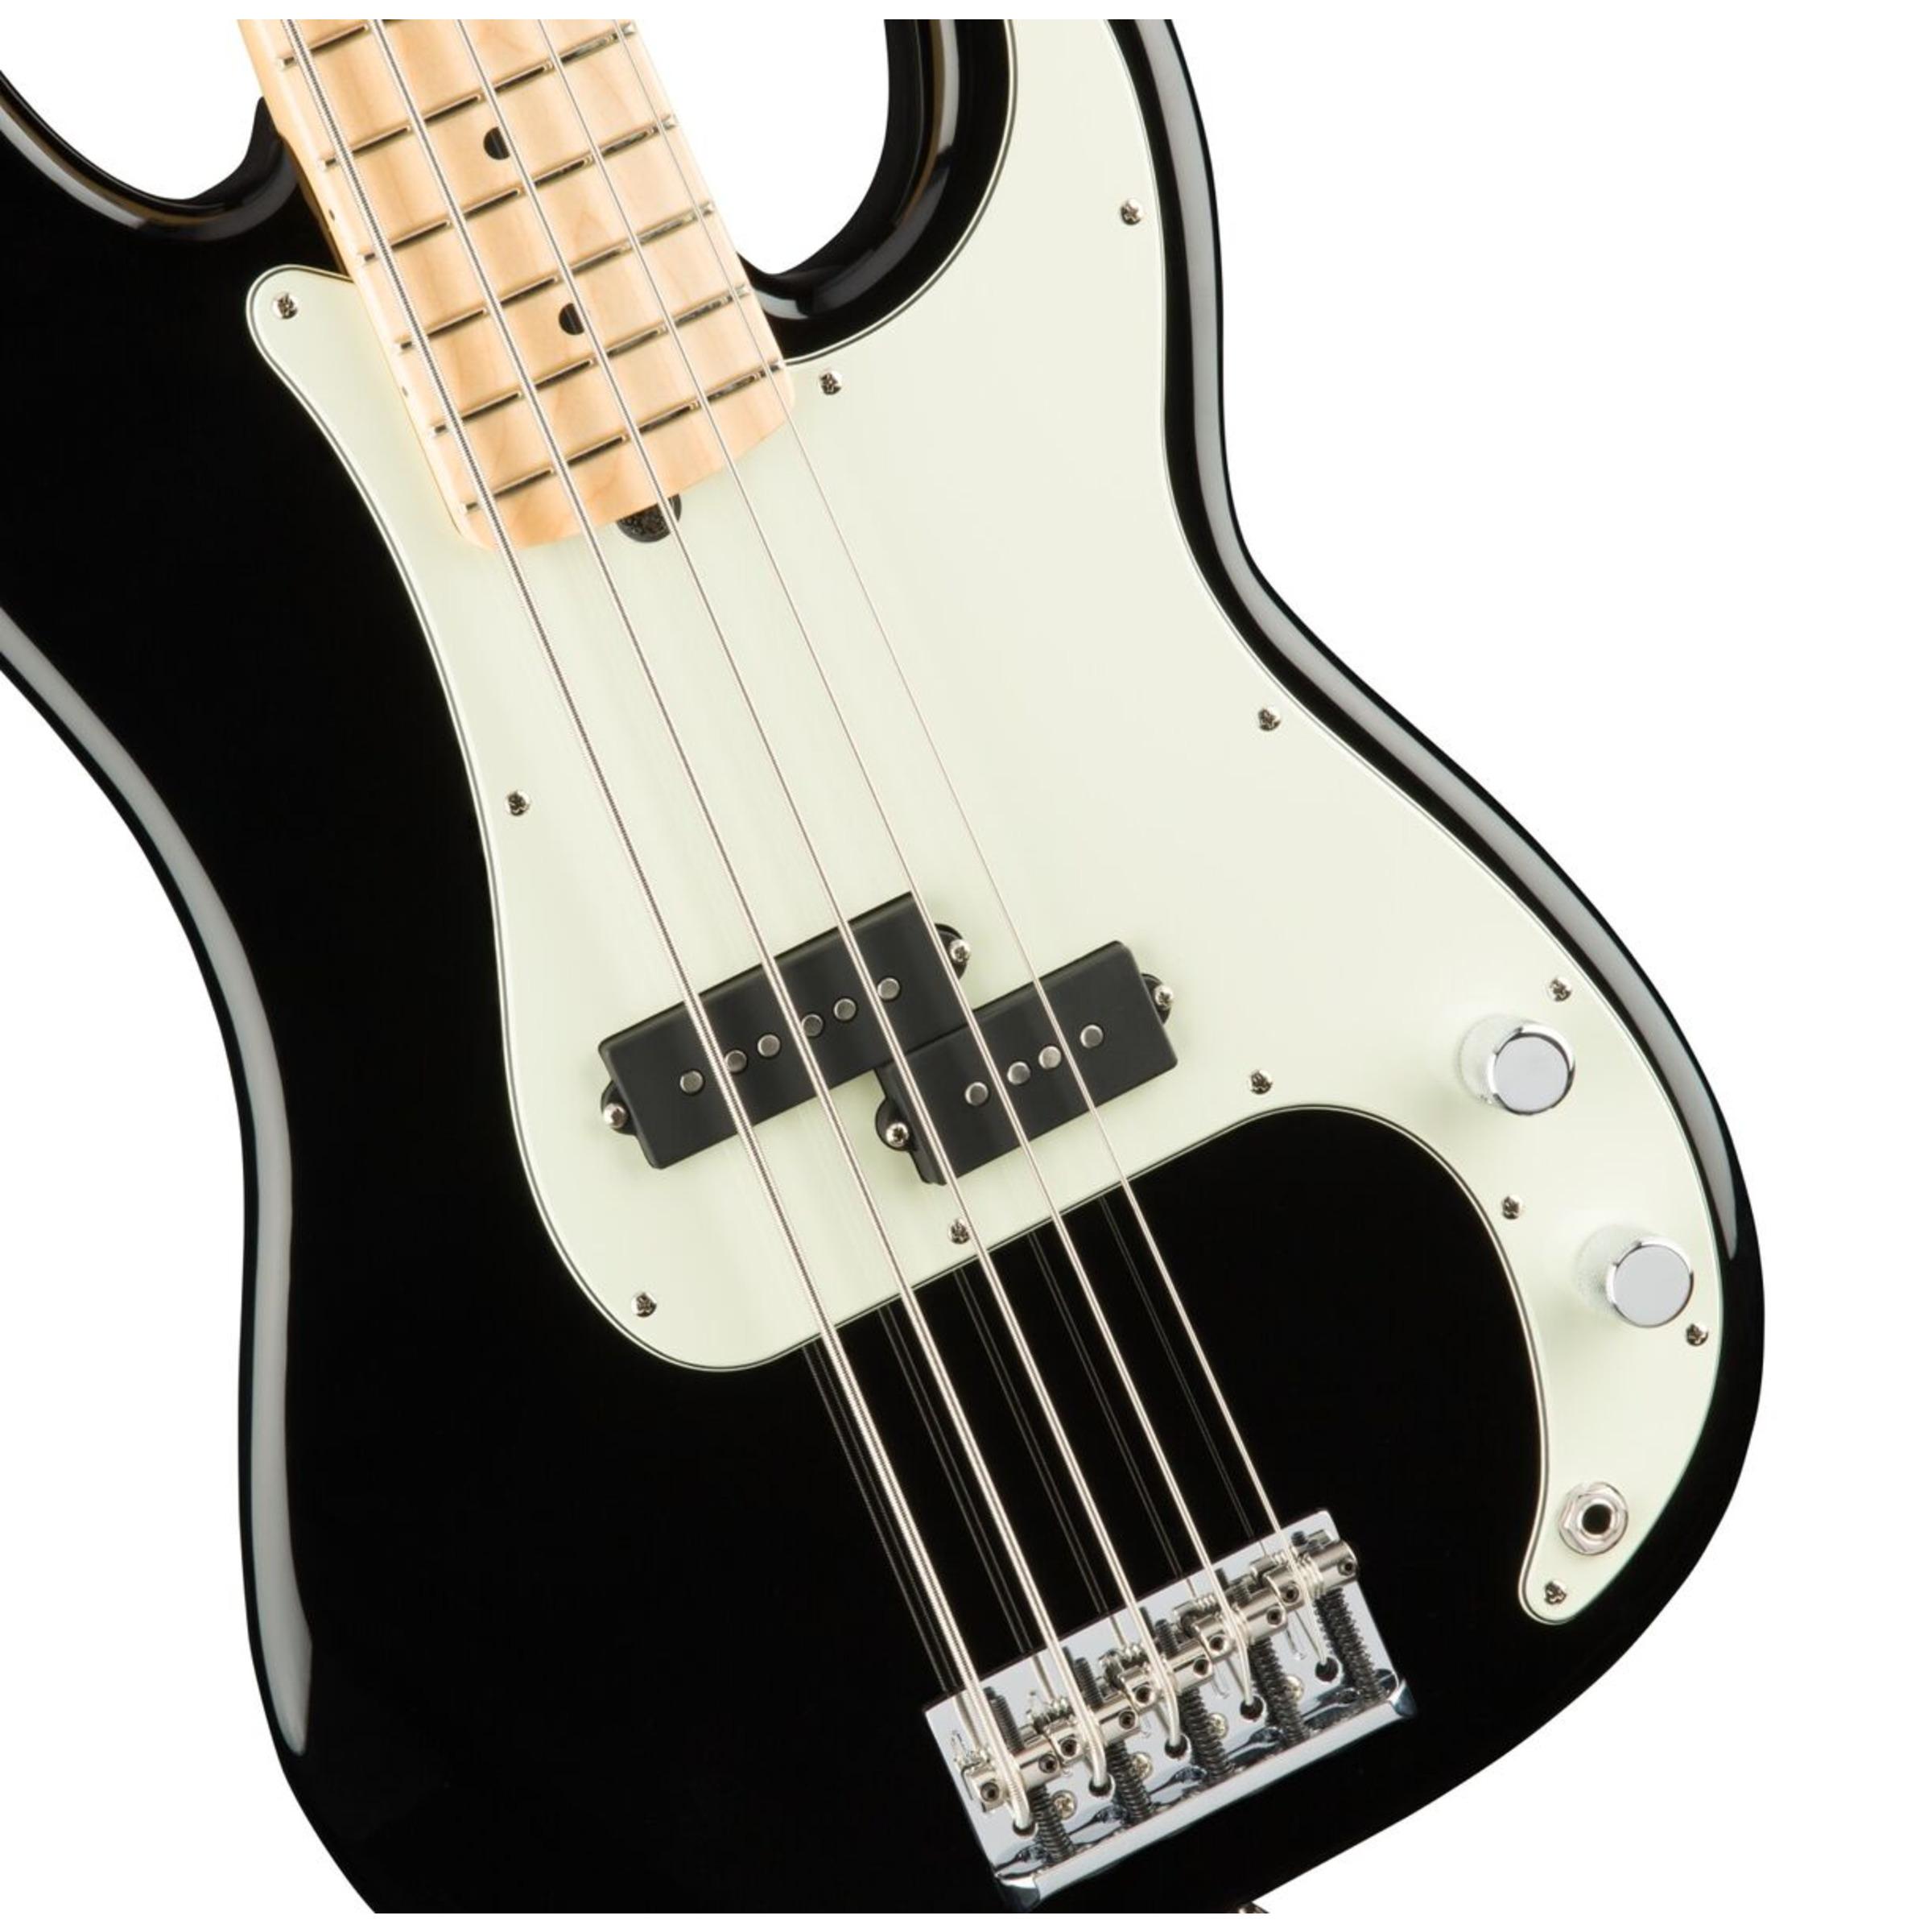 fender american pro p bass 5 string maple fingerboard giggear. Black Bedroom Furniture Sets. Home Design Ideas